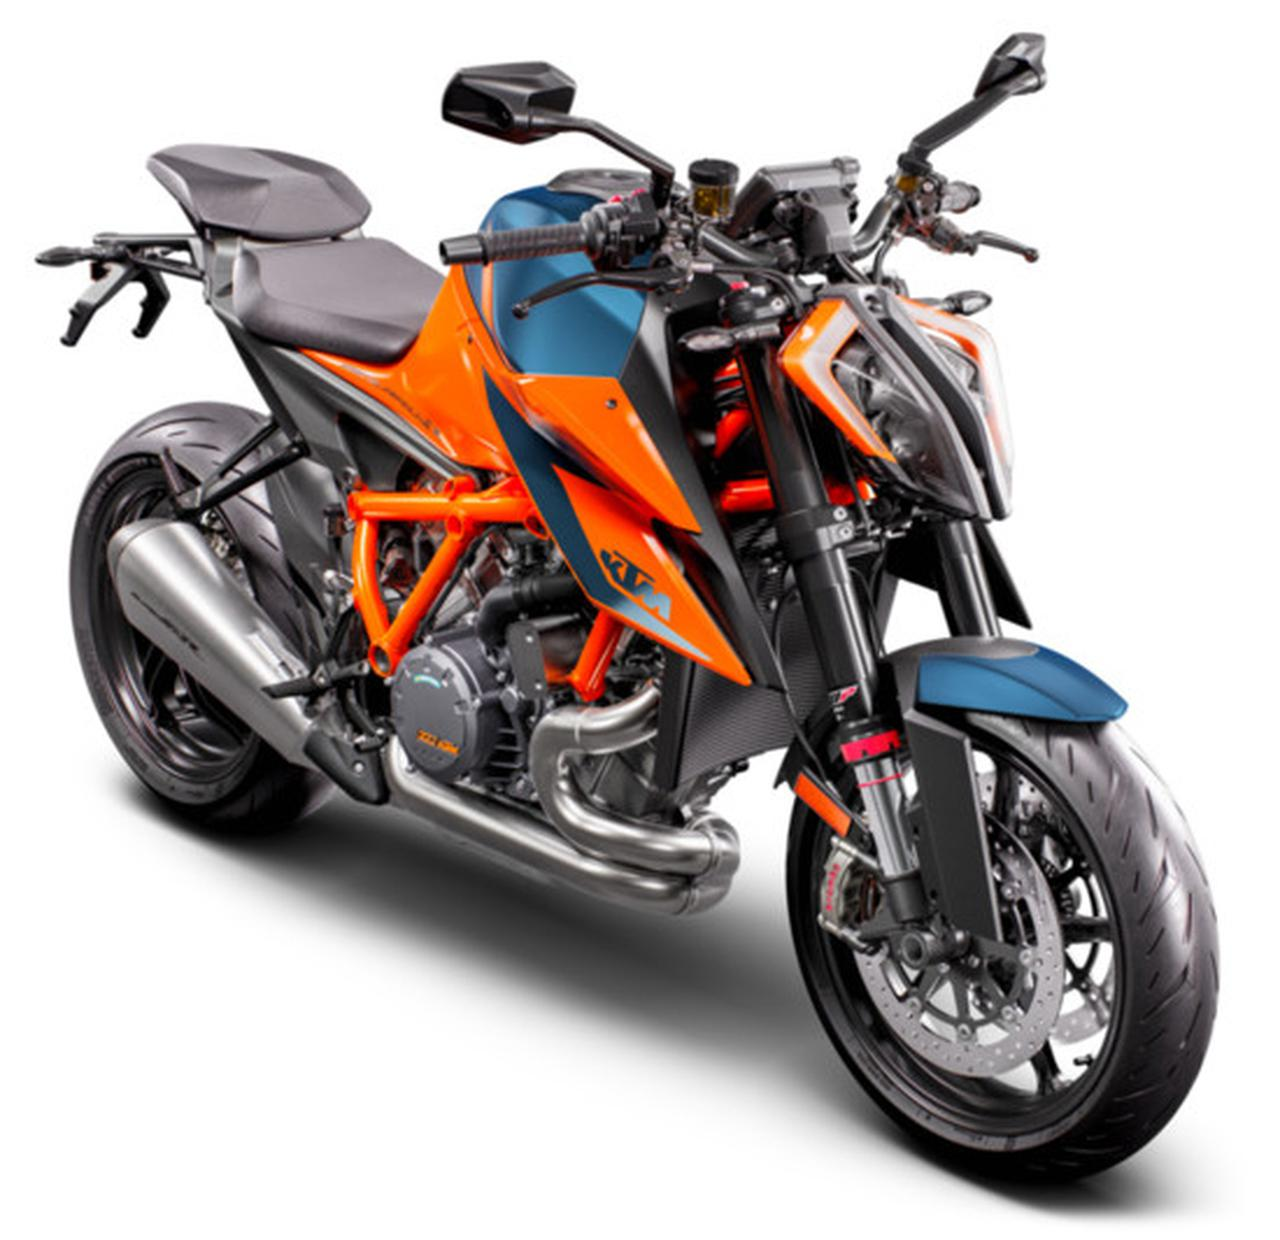 Images : 10番目の画像 - KTM「1290 SUPER DUKE R」の写真を全て見る! - webオートバイ